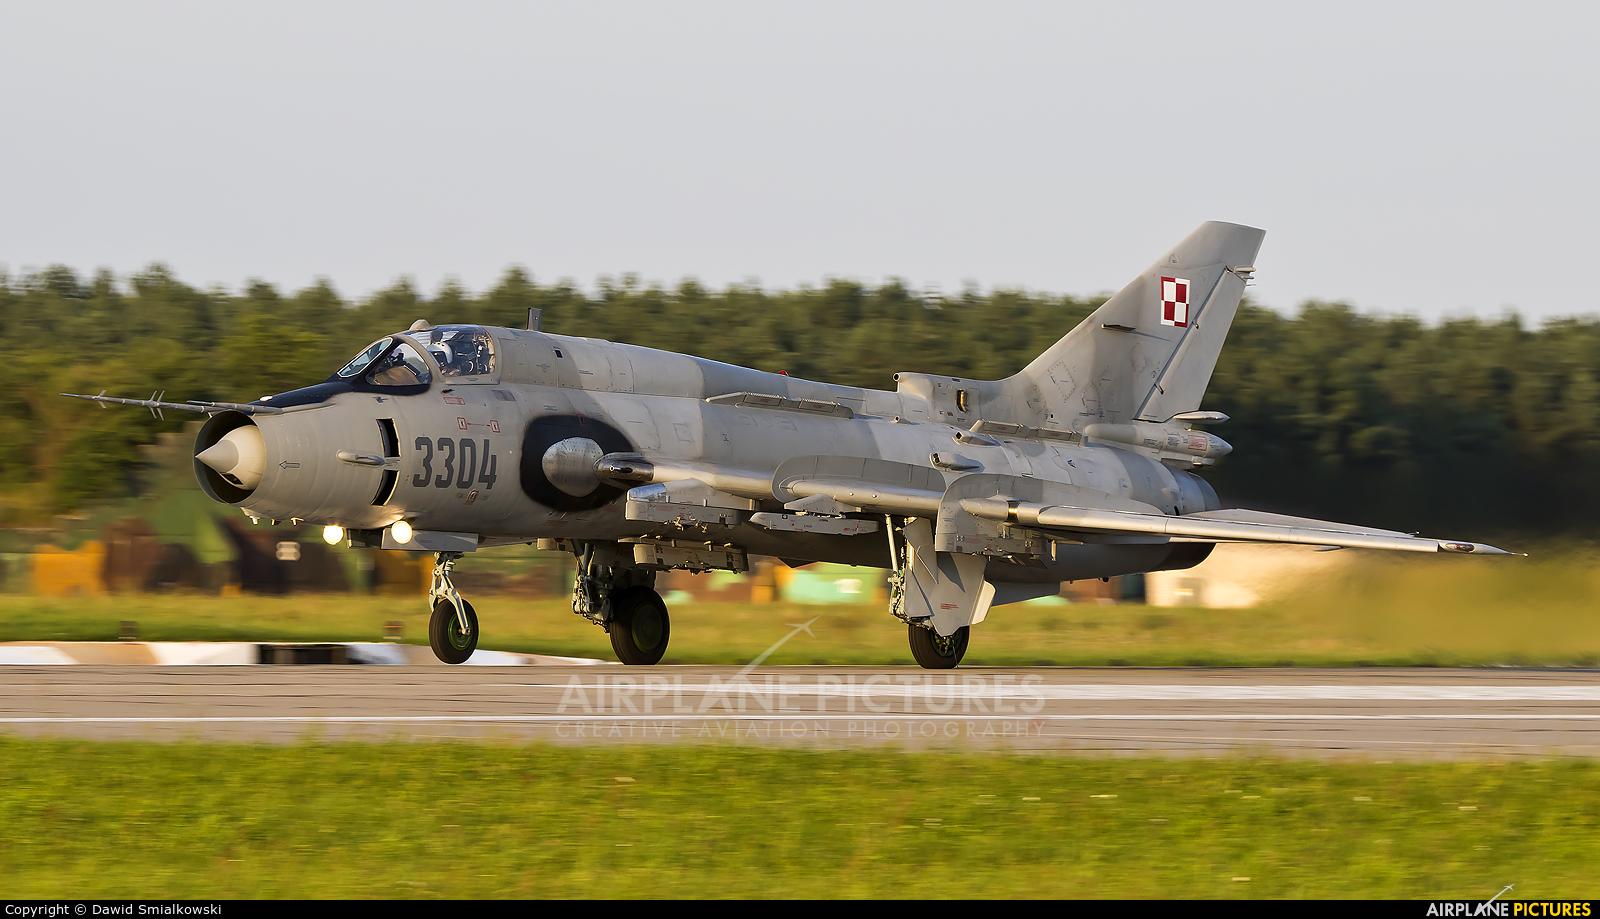 Poland - Air Force 3304 aircraft at Mirosławiec